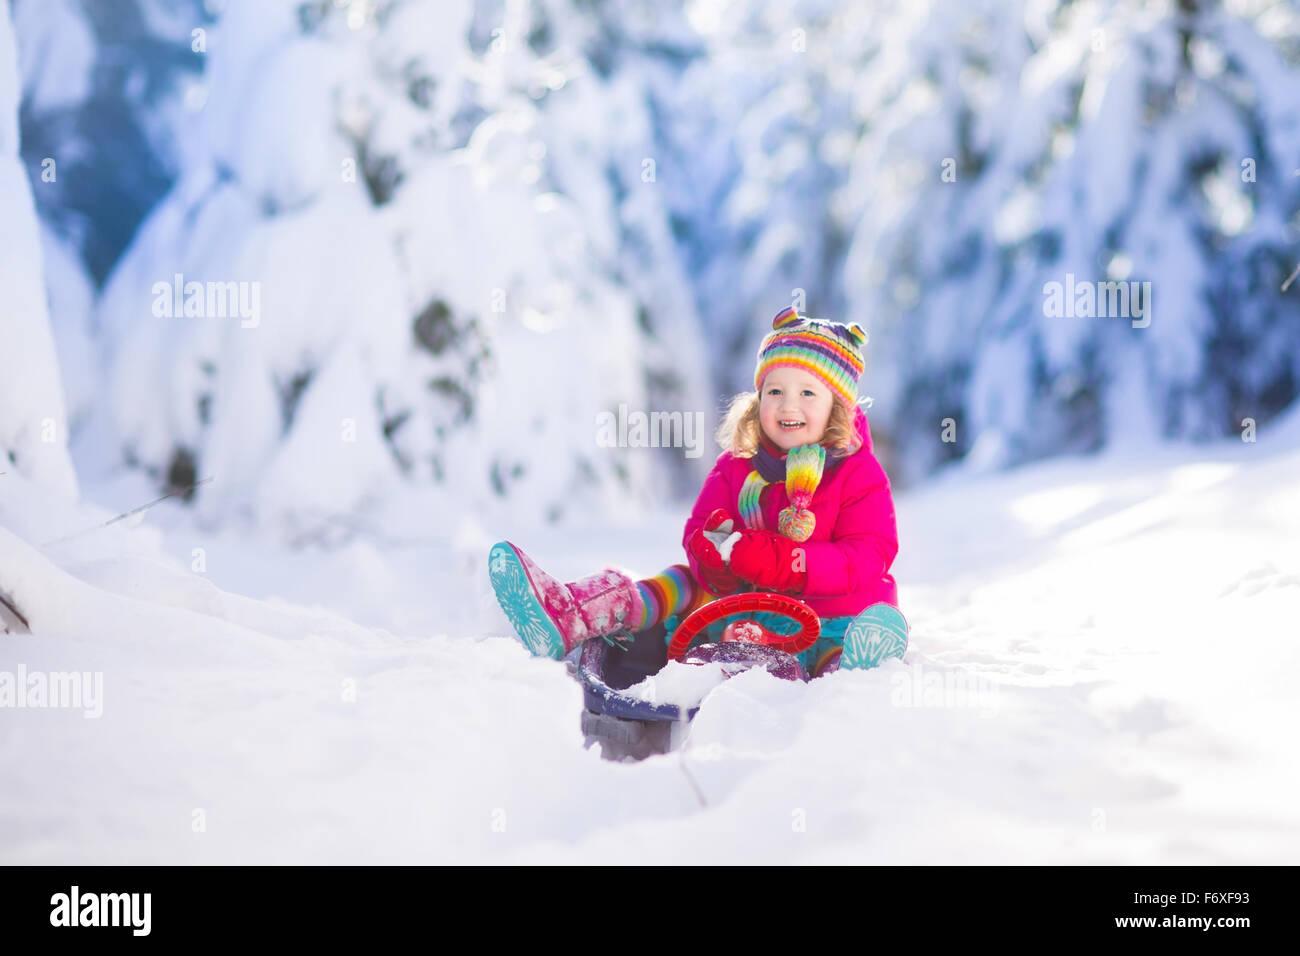 christmas vacation sled riding - Christmas Vacation Sled